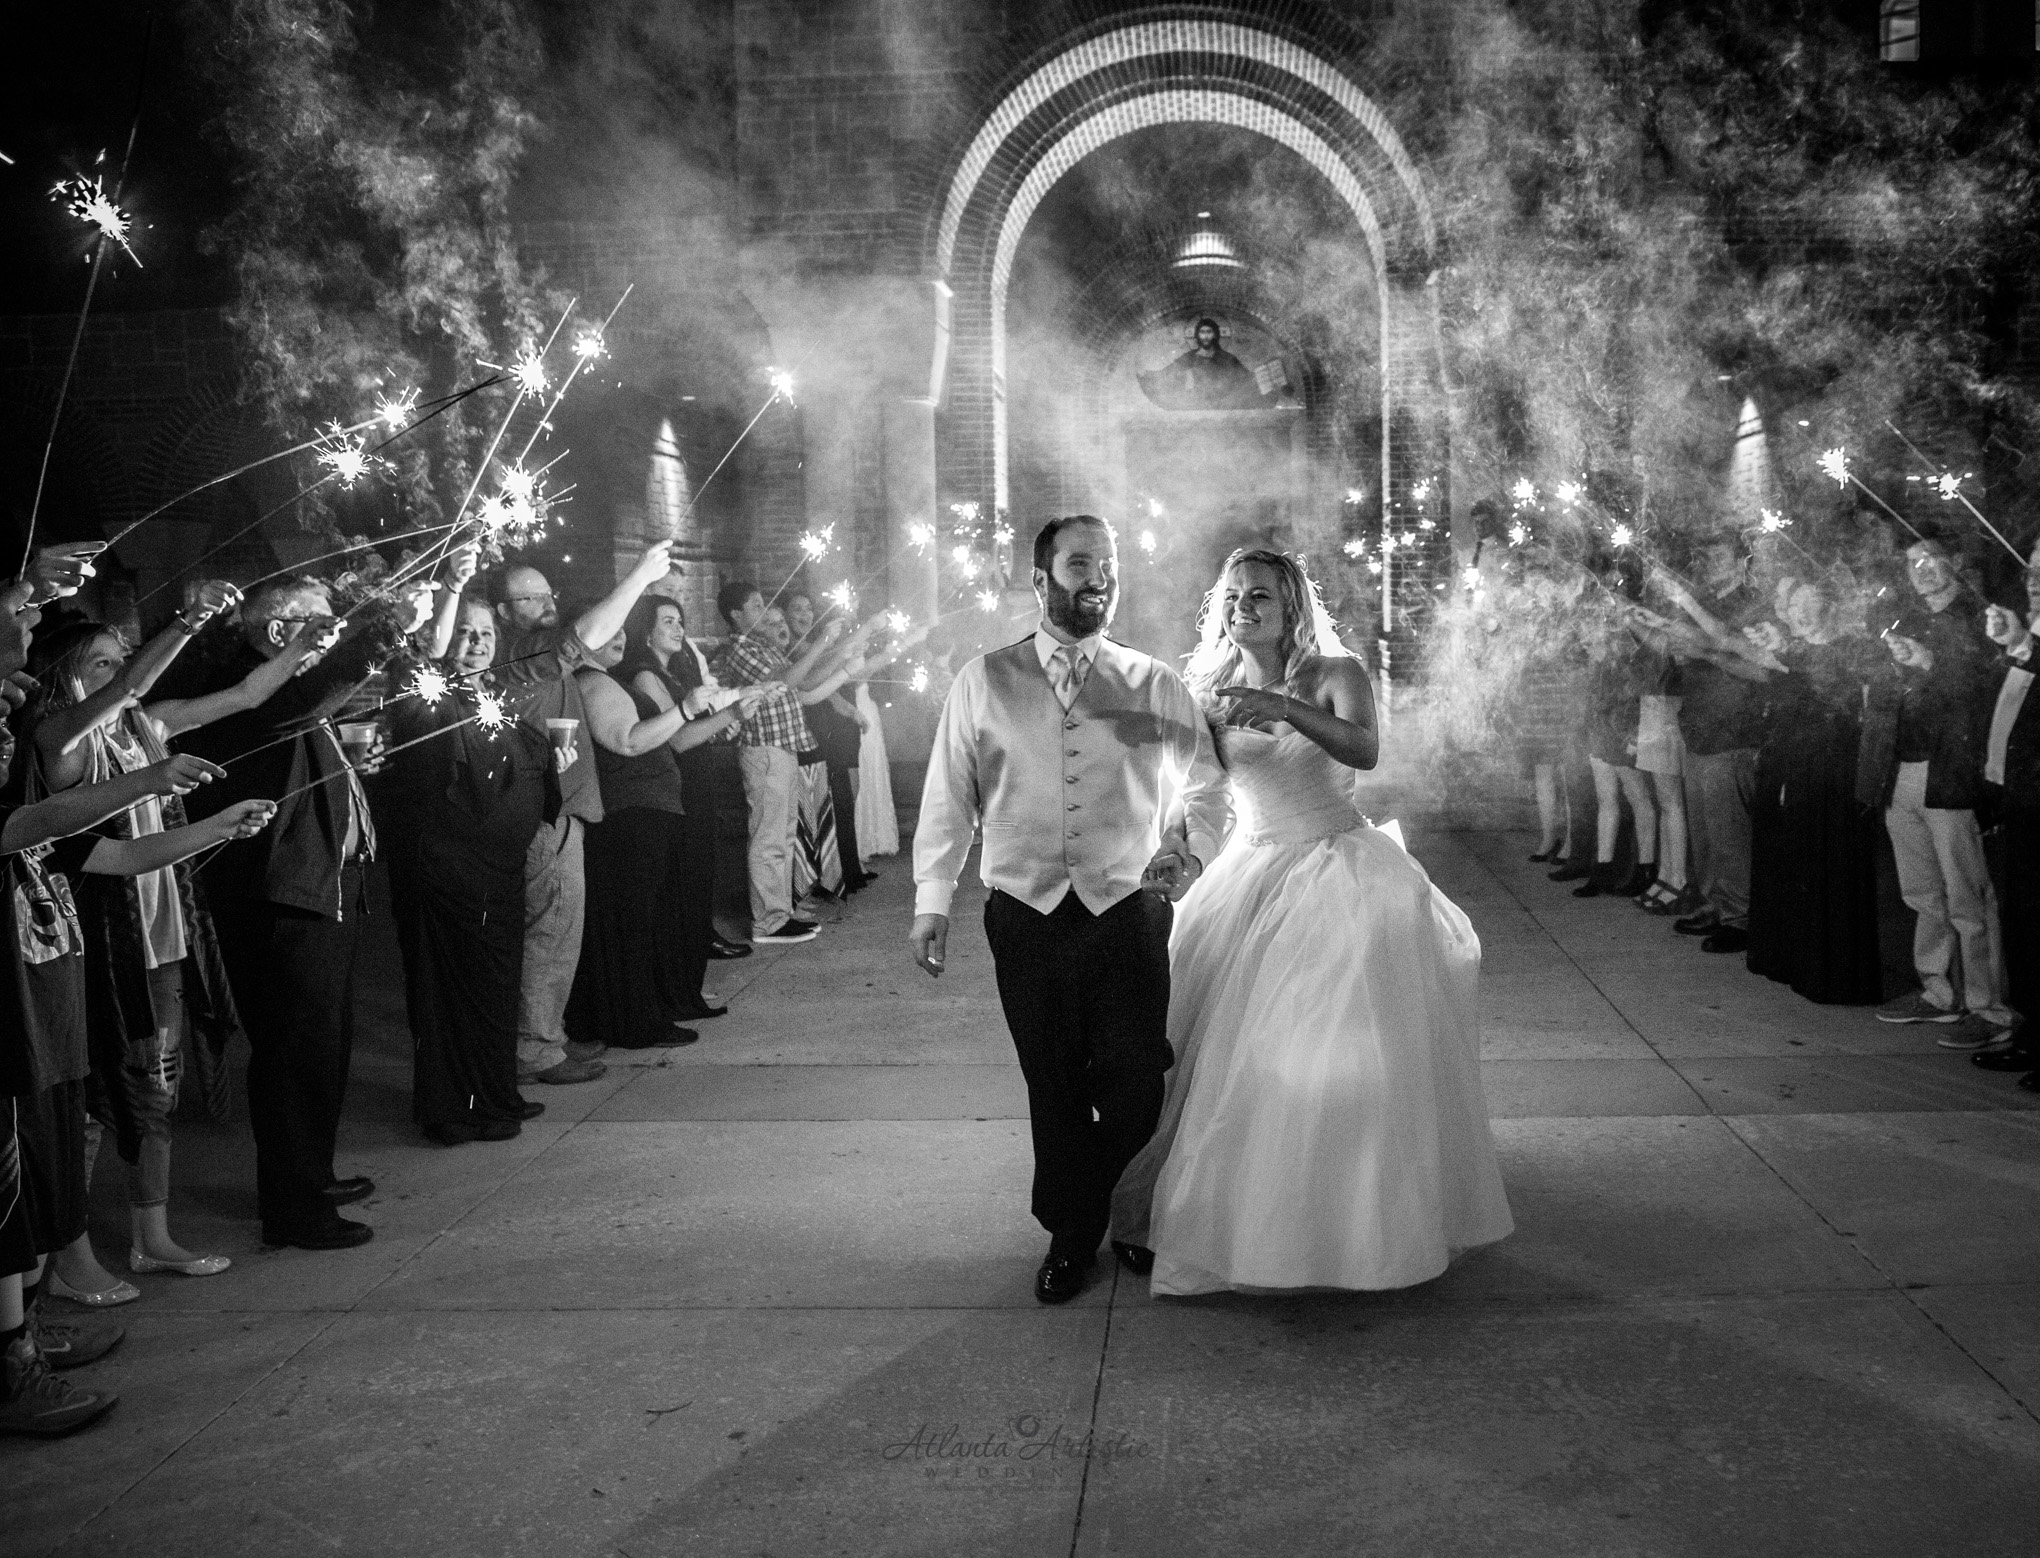 Atlanta wedding photographers capture sparkler exit